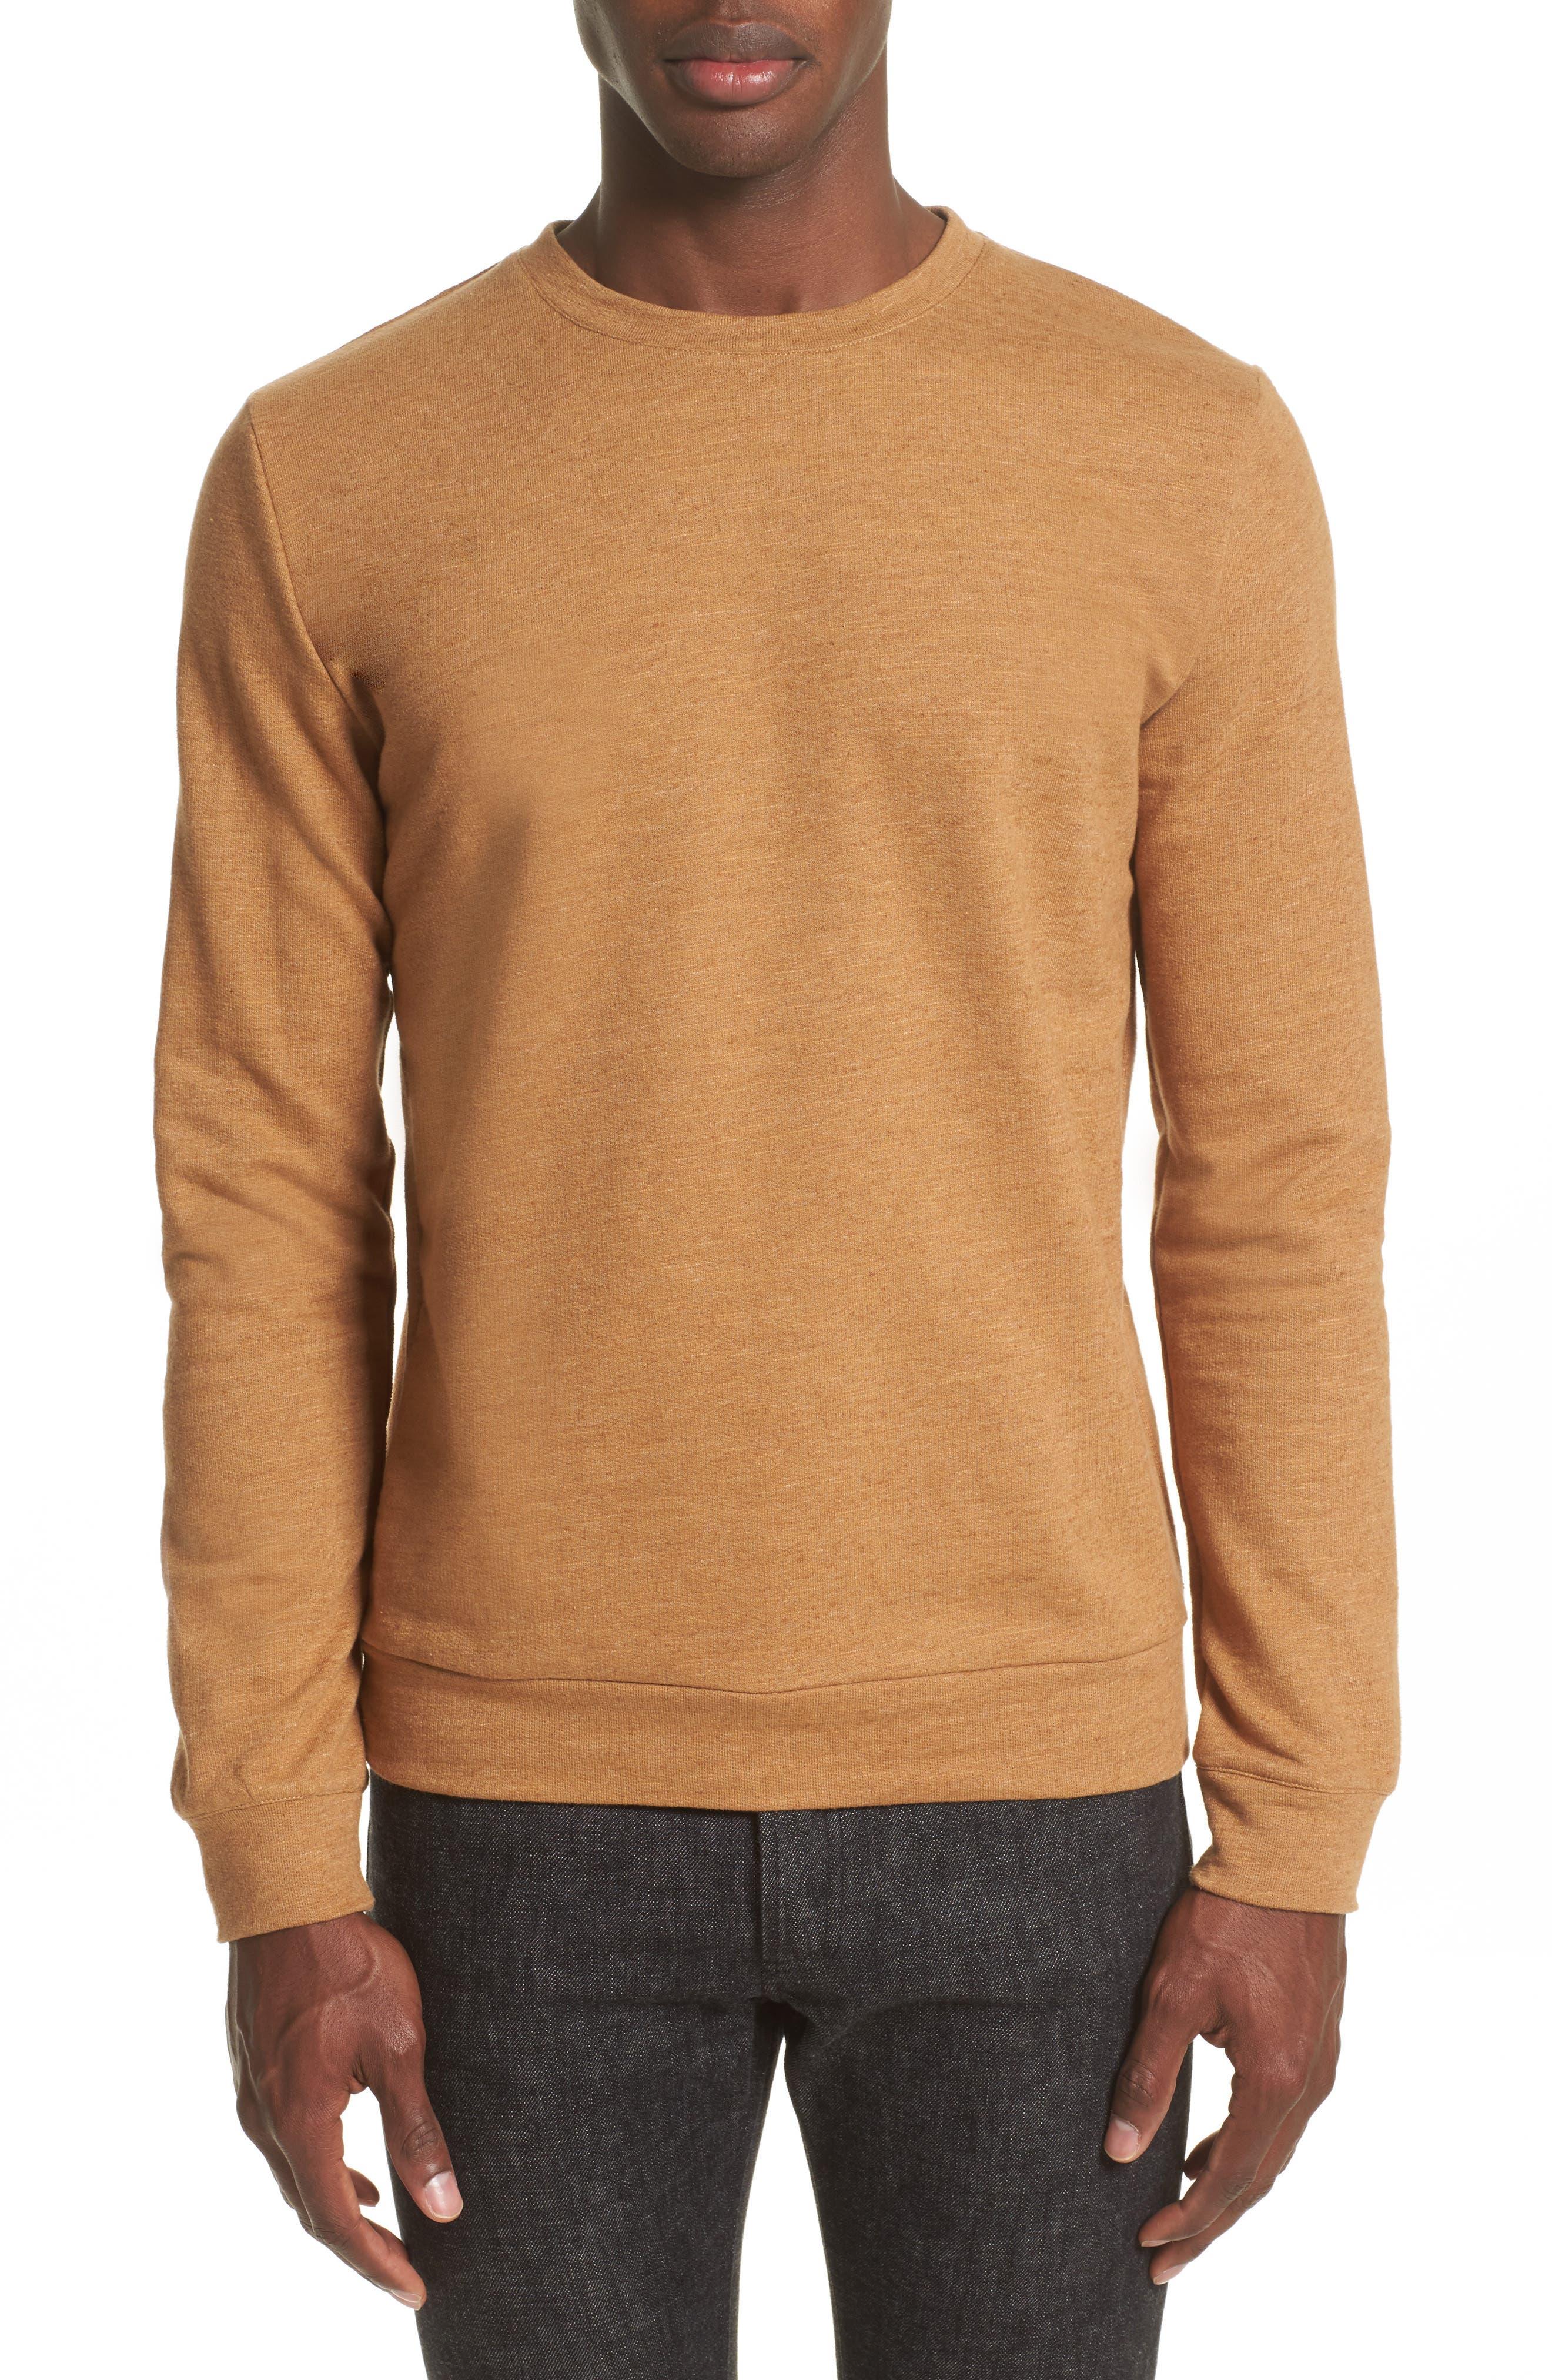 A.P.C. Joseph Trim Fit Sweatshirt